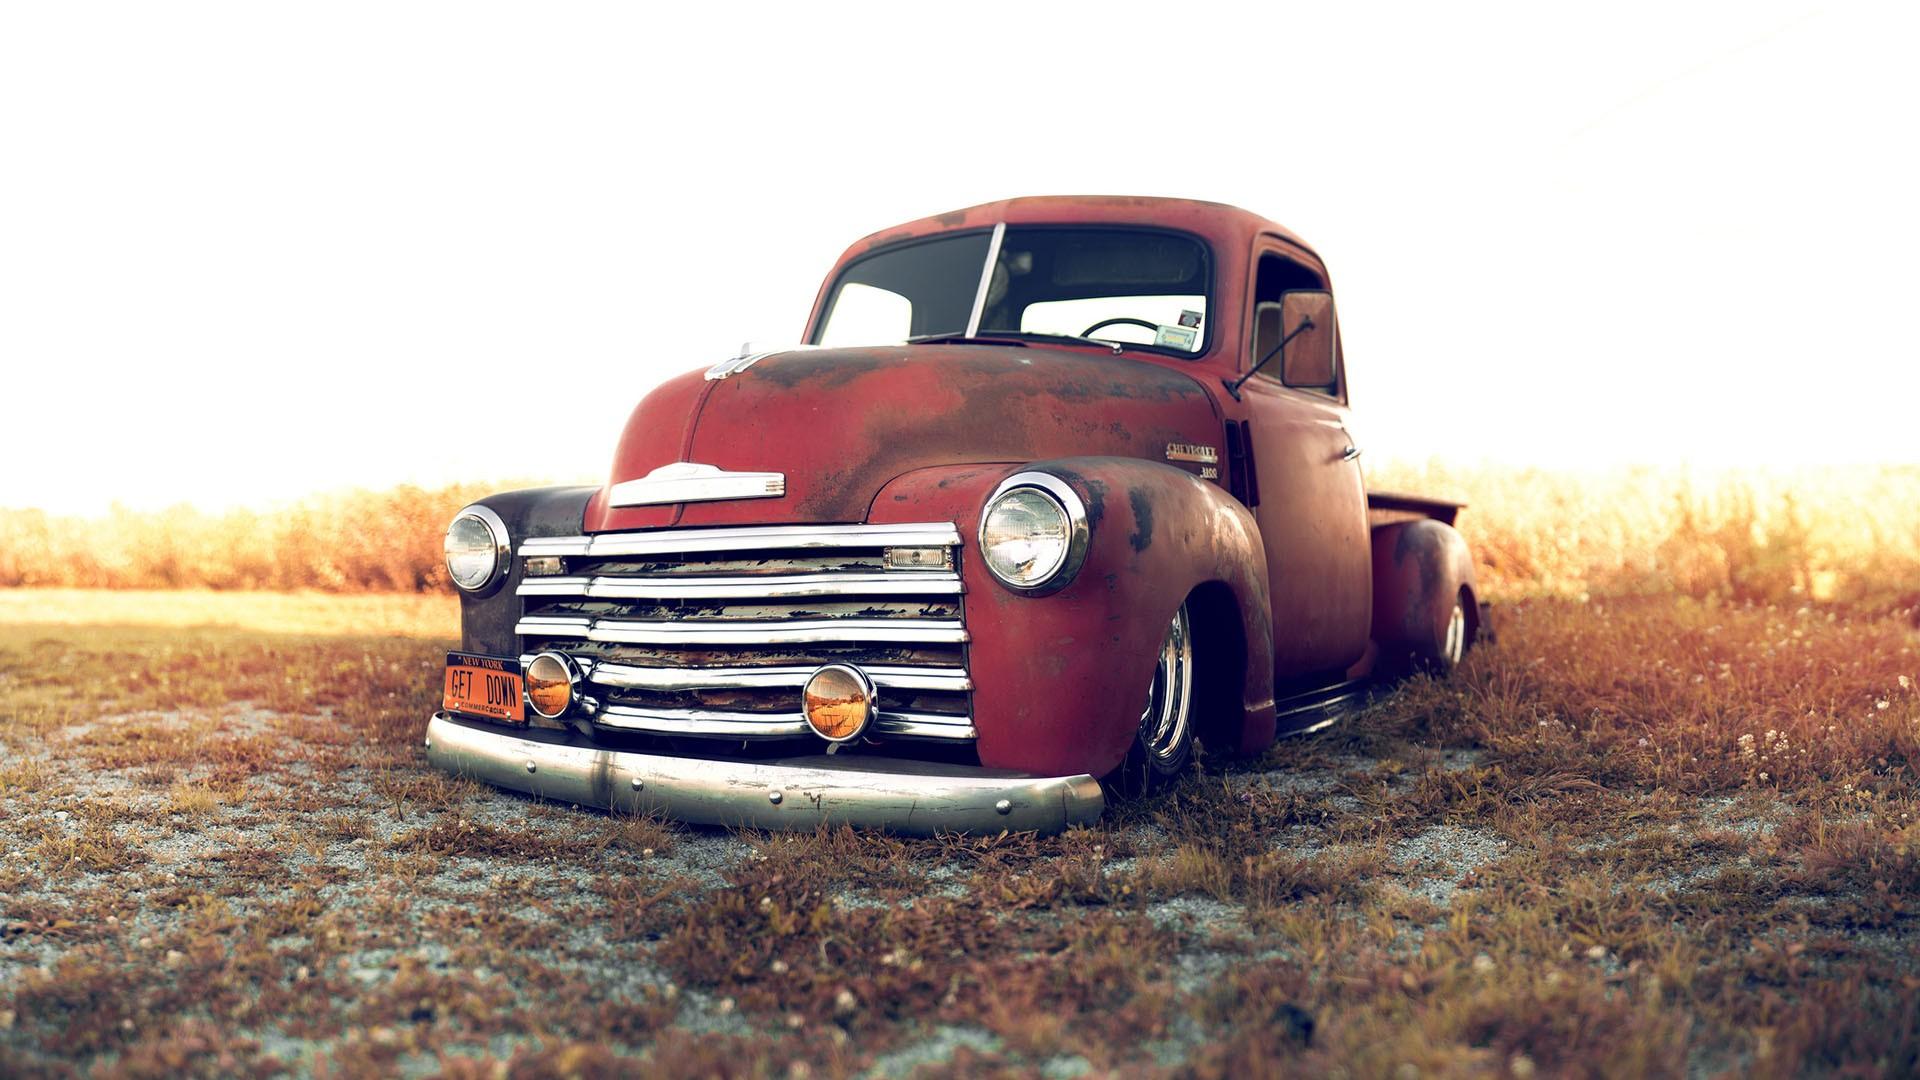 1949 CHEVY chevrolet trucks lowriders custom classic cars wallpaper 1920x1080